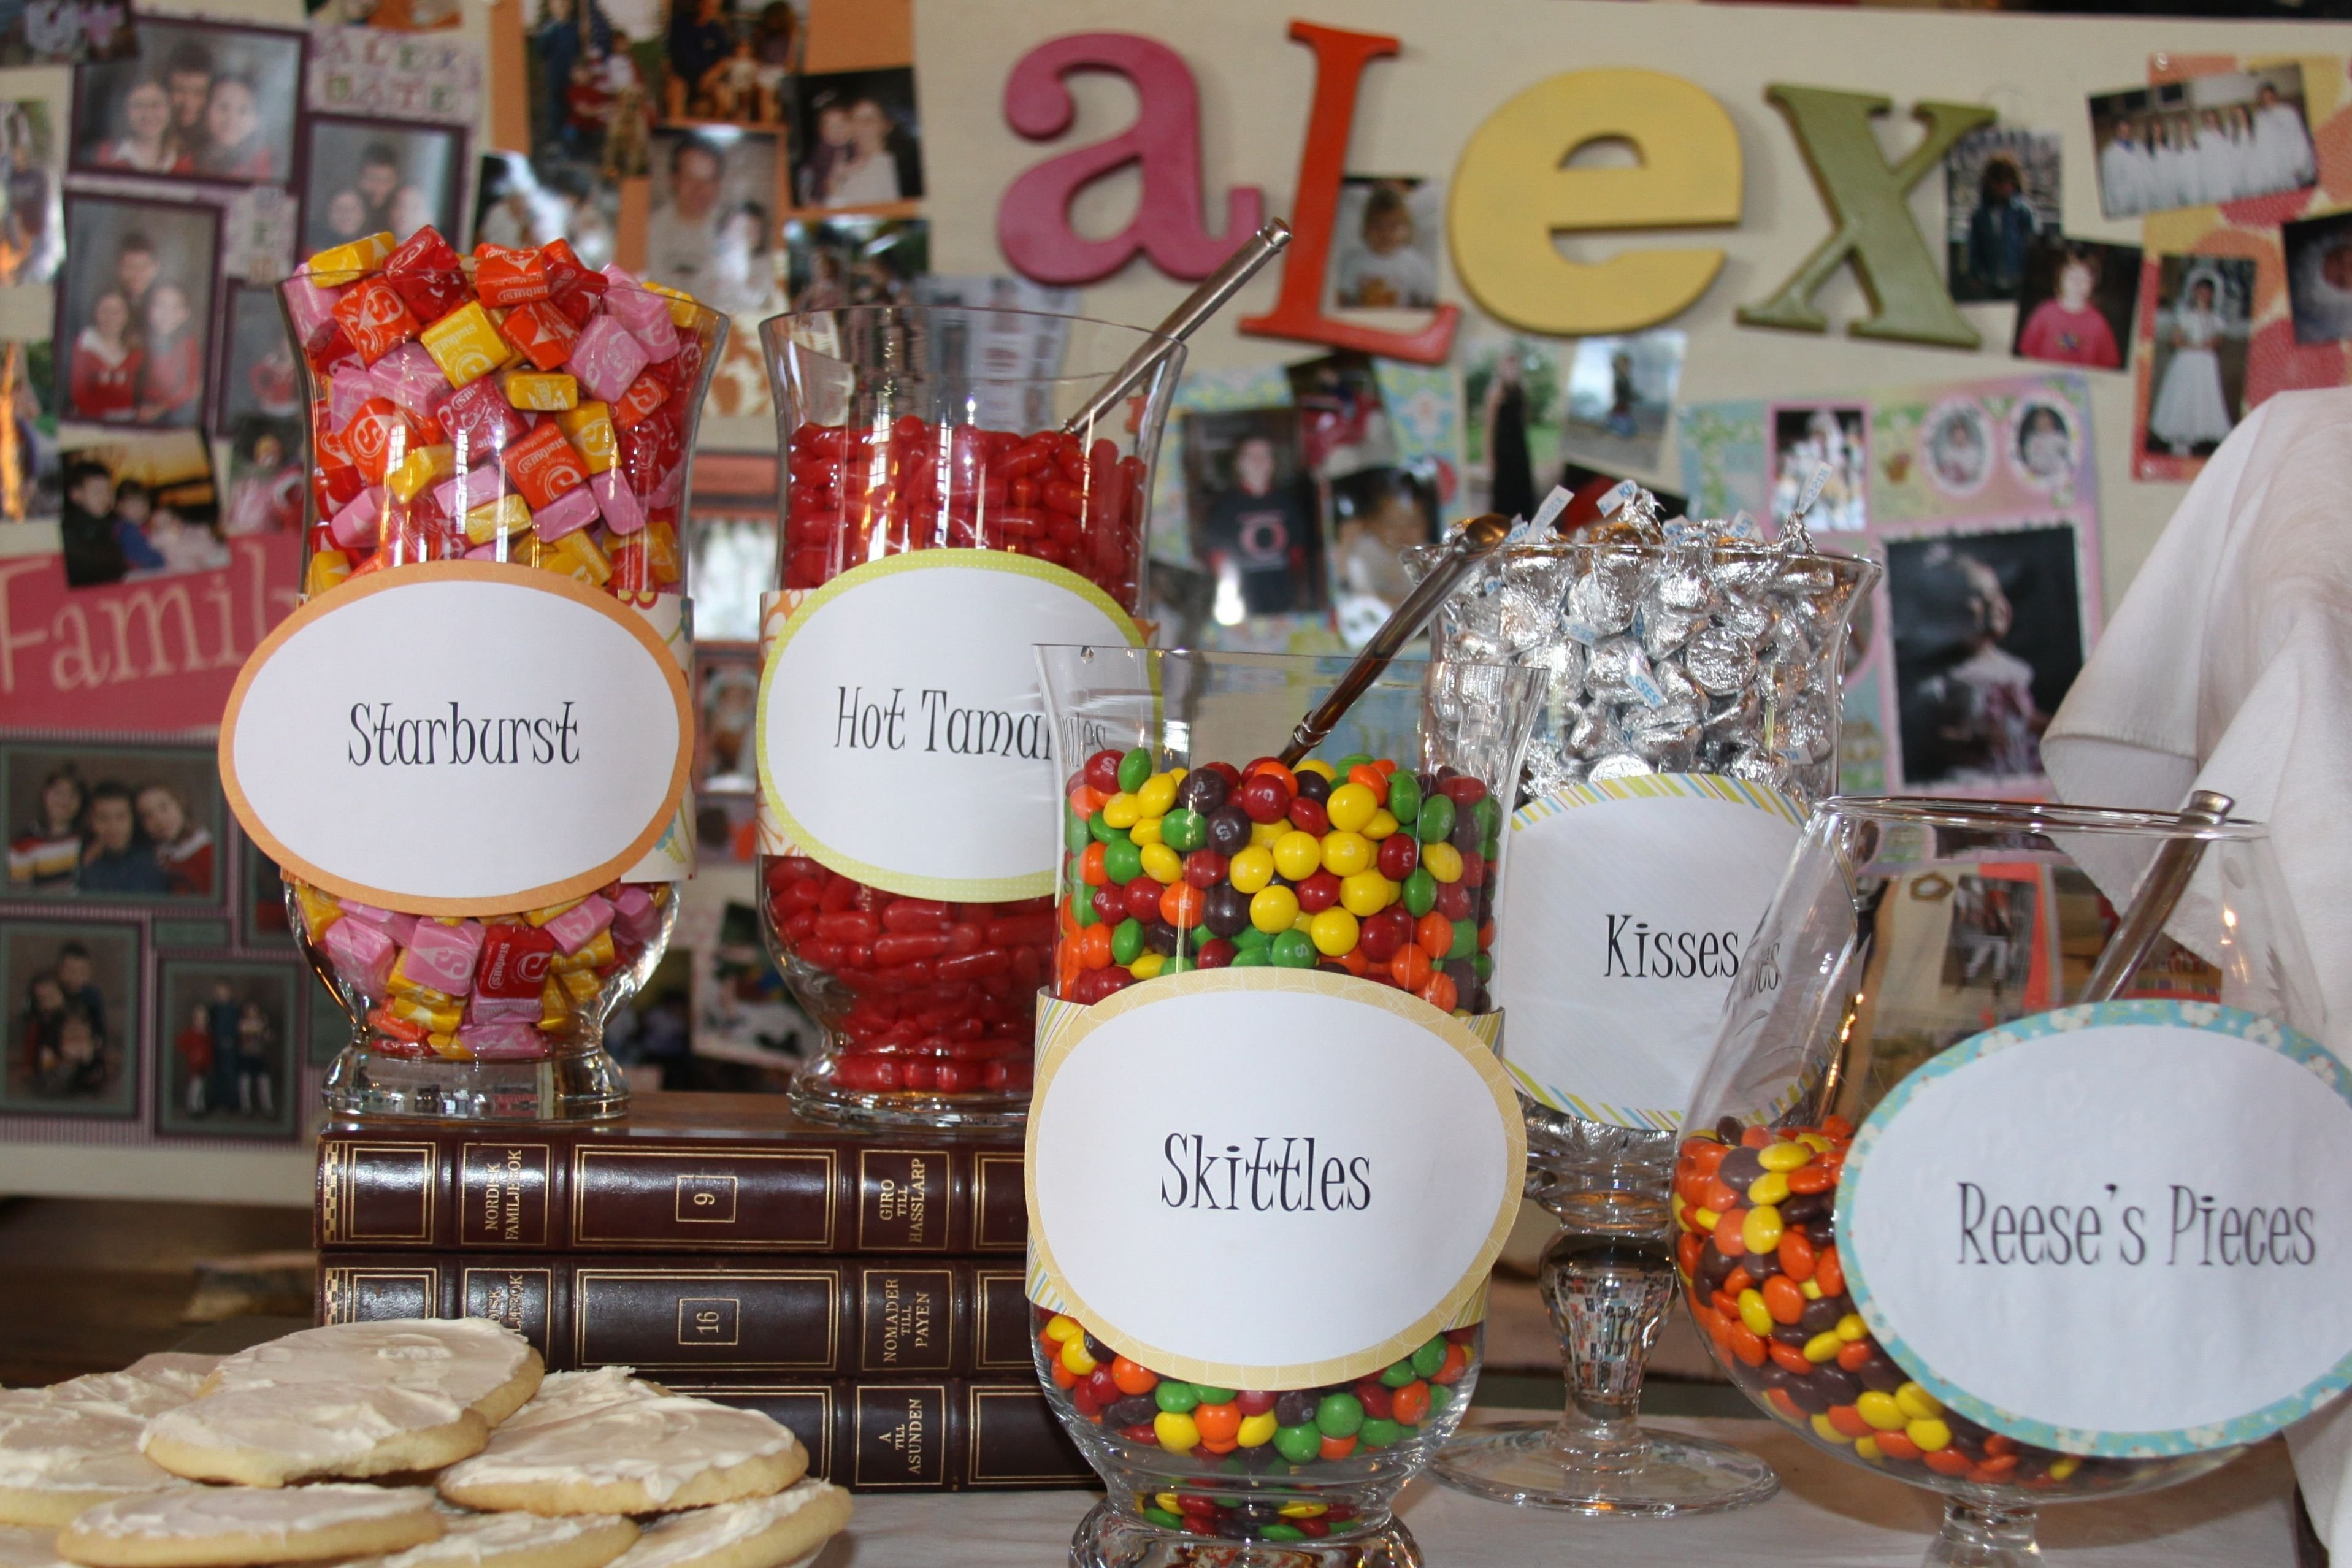 10 Best High School Graduation Party Ideas For Boys high school graduation party ideas graduation party food ideas 2 2020